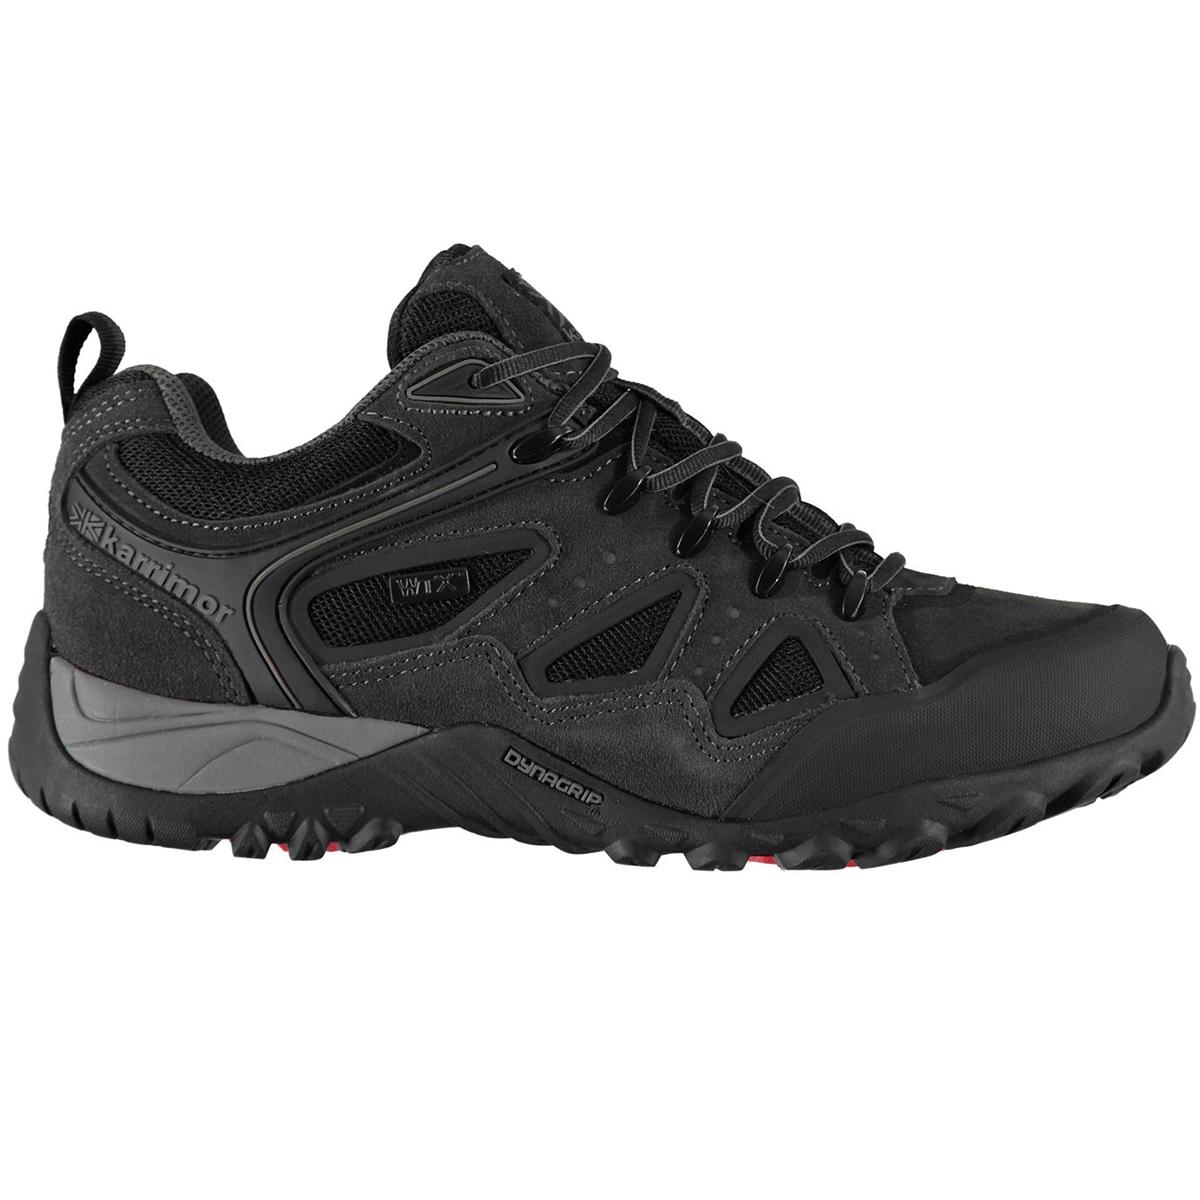 Karrimor Men's Ridge Wtx Waterproof Low Hiking Shoes - Black, 9.5